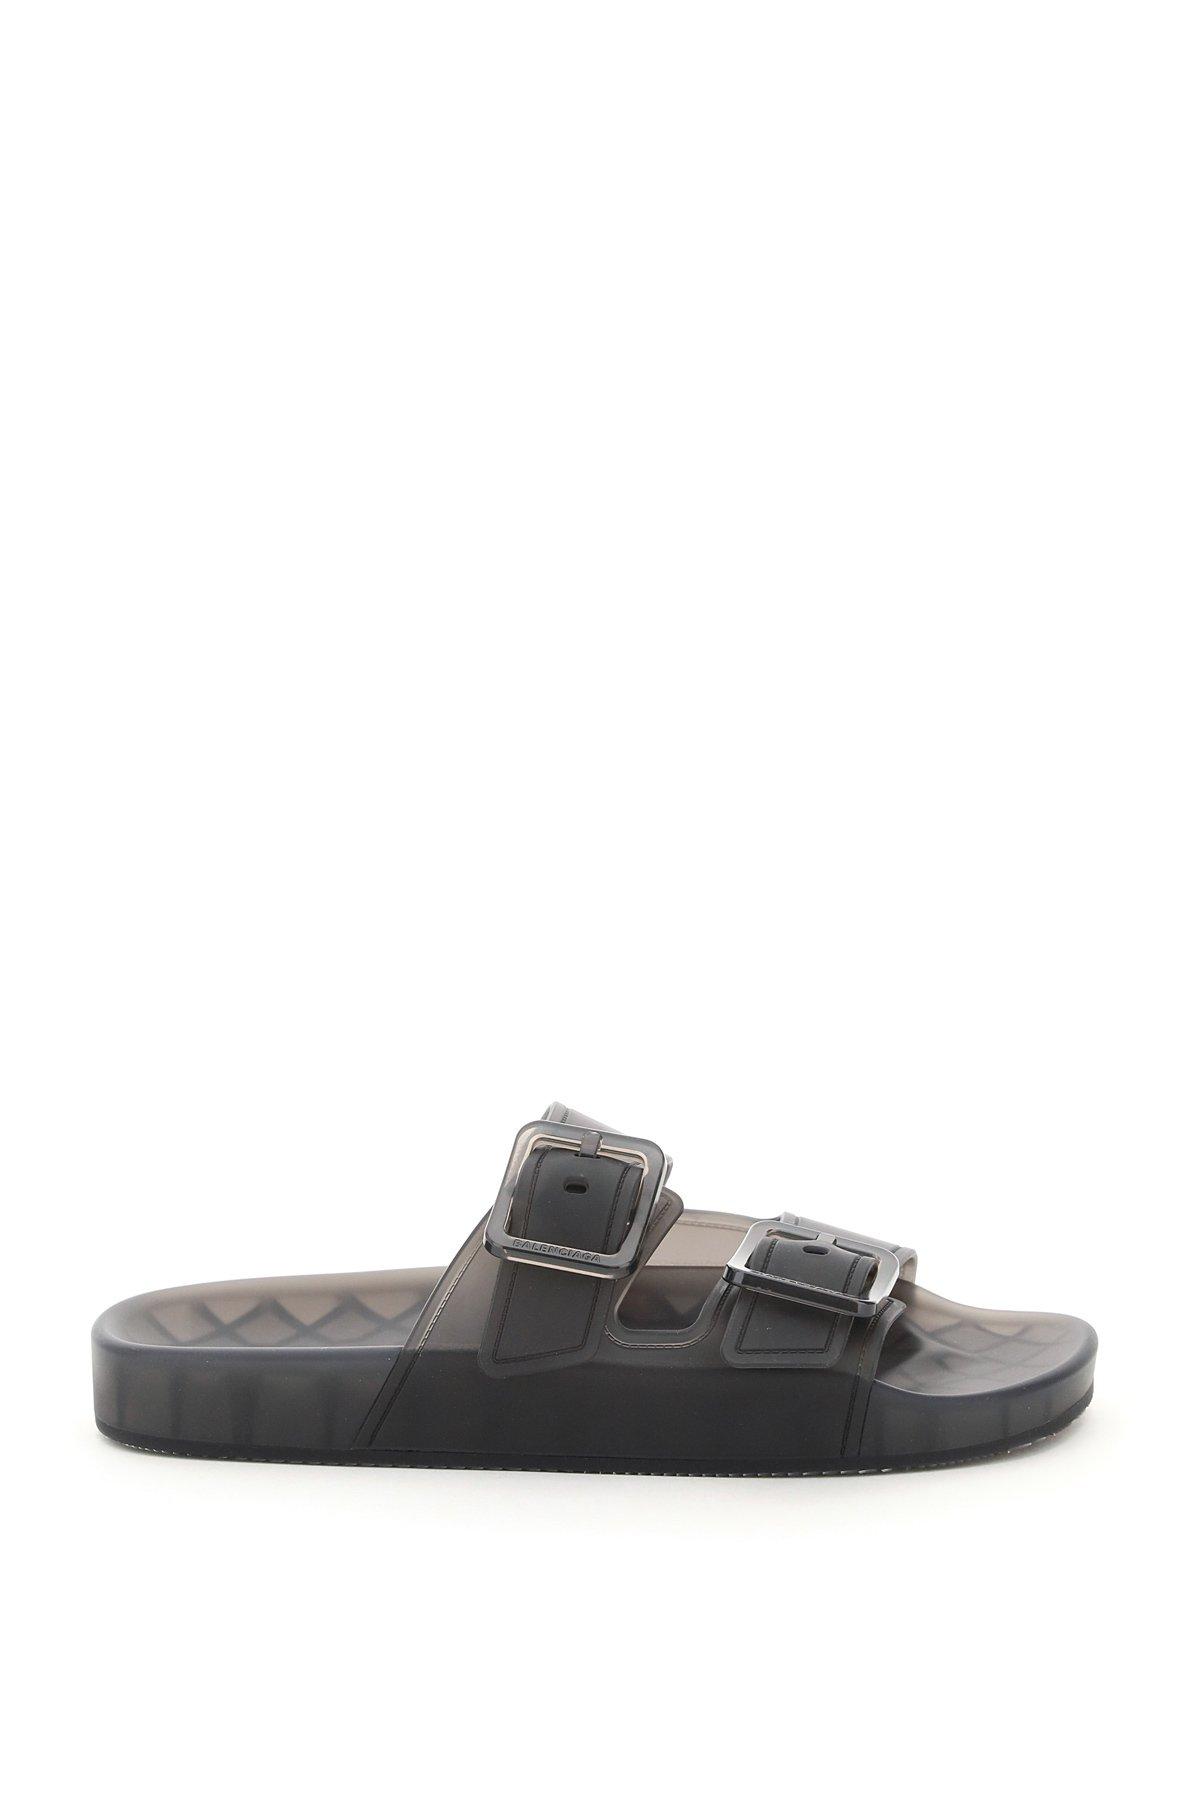 Balenciaga sandali in gomma mallorca